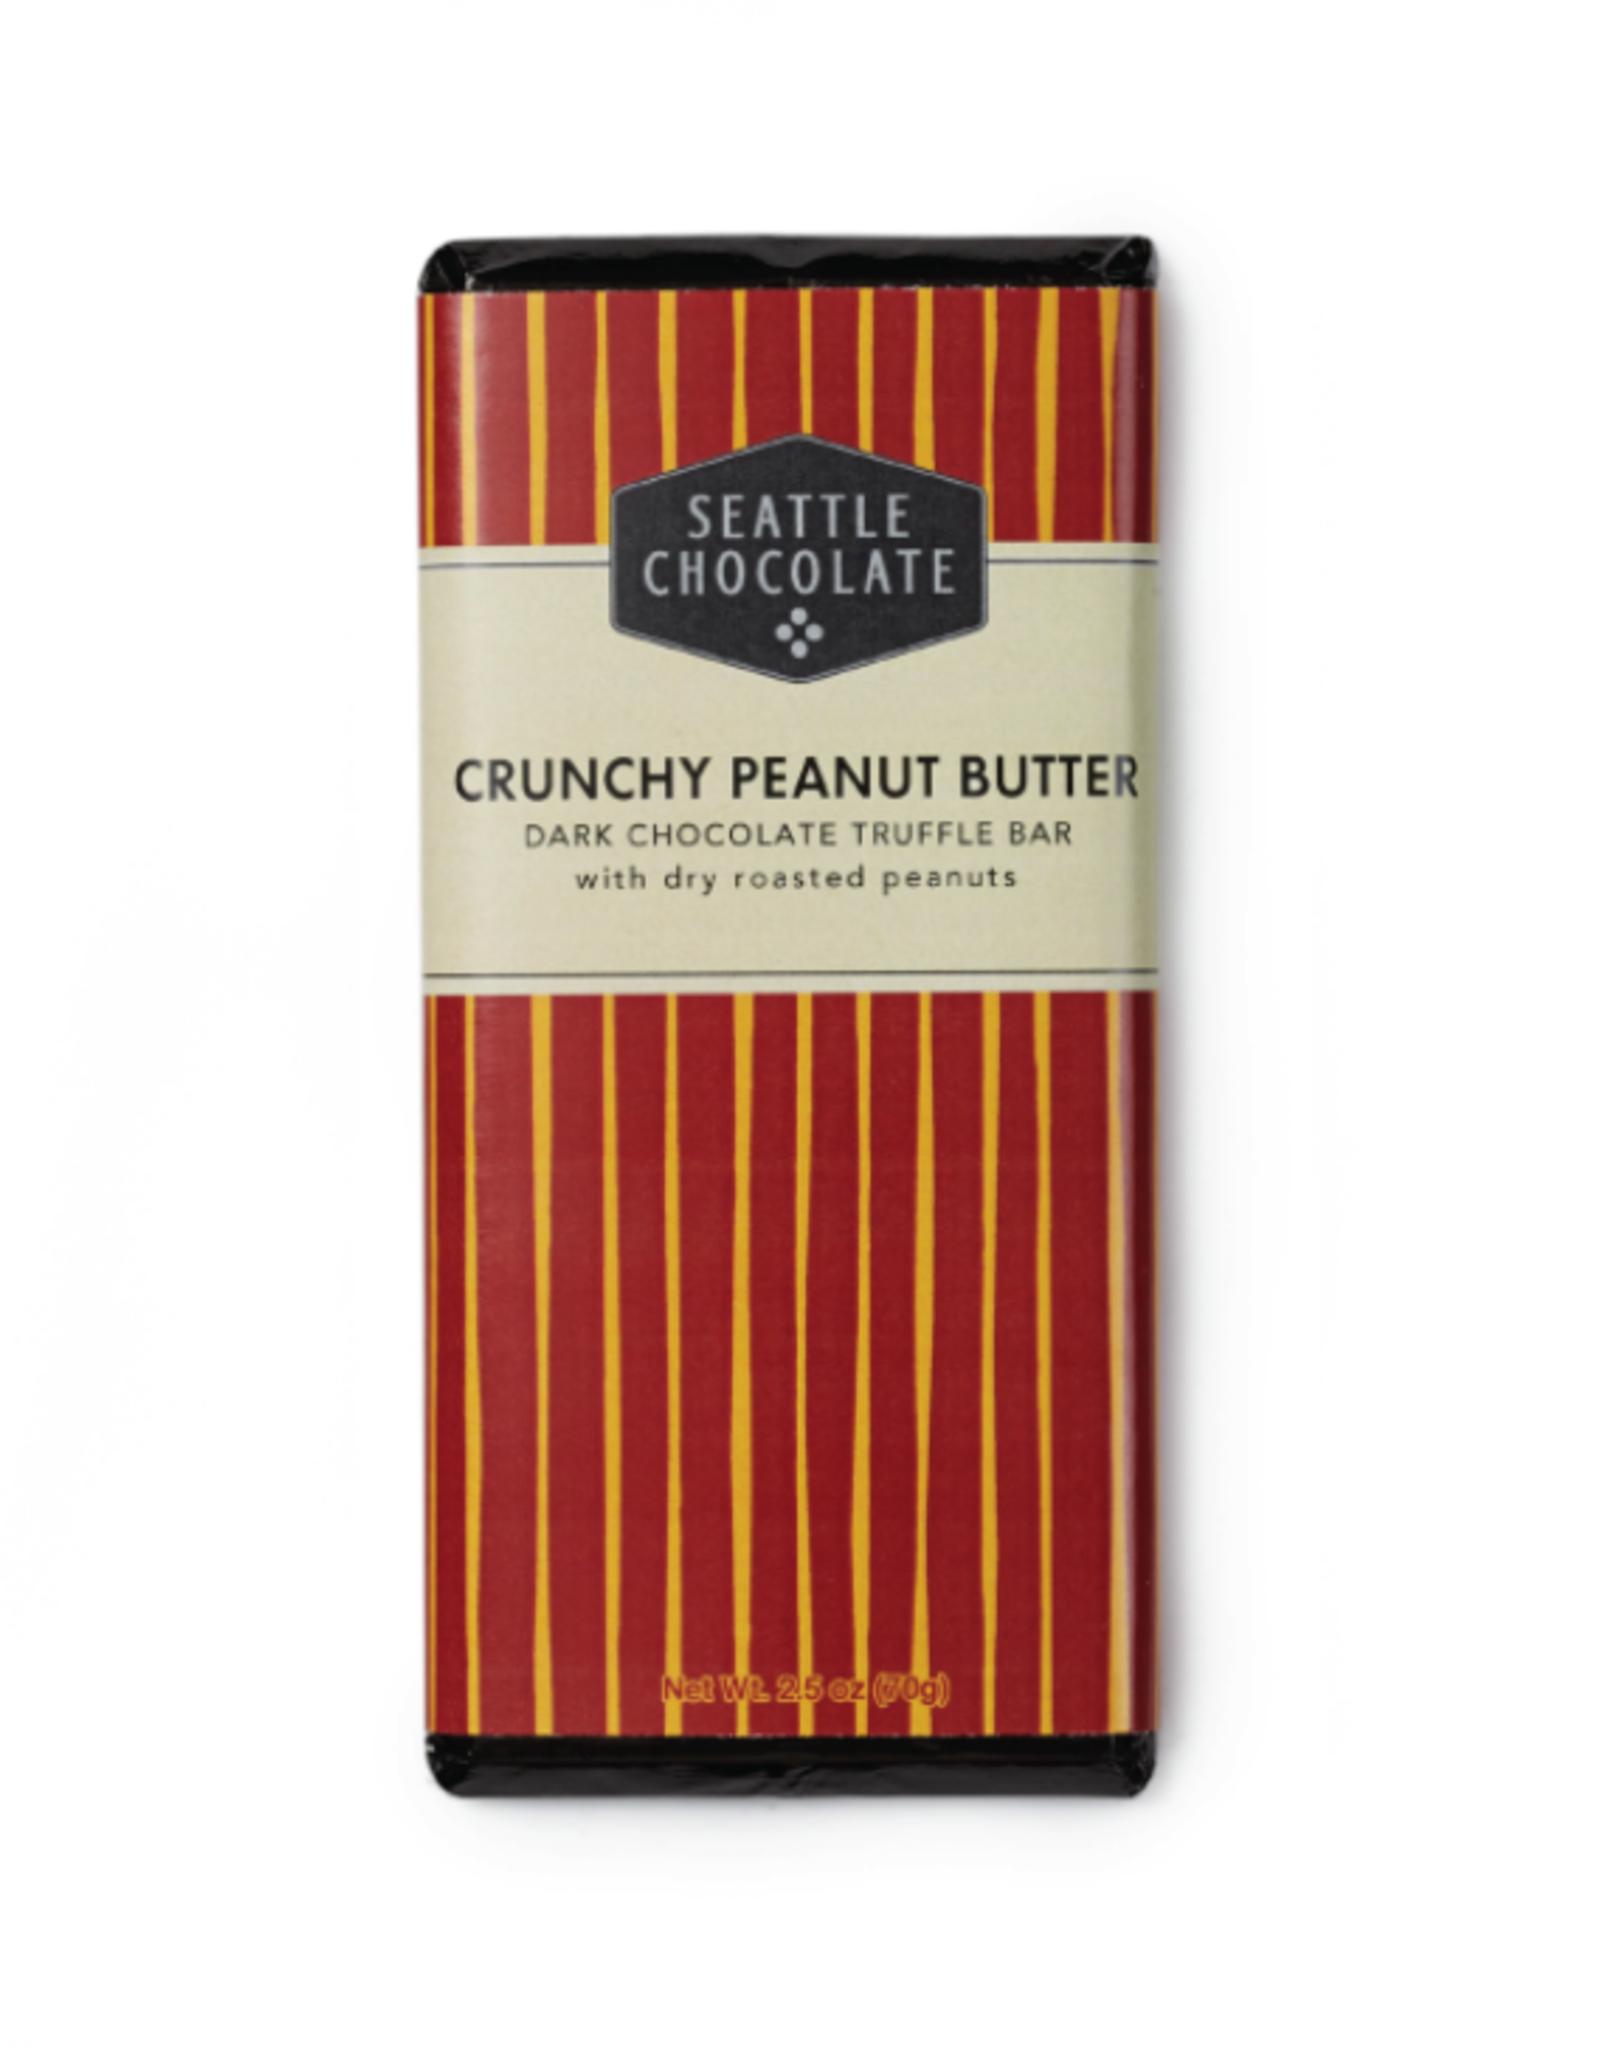 Seattle Chocolate Crunchy Peanut Butter Truffle Bar